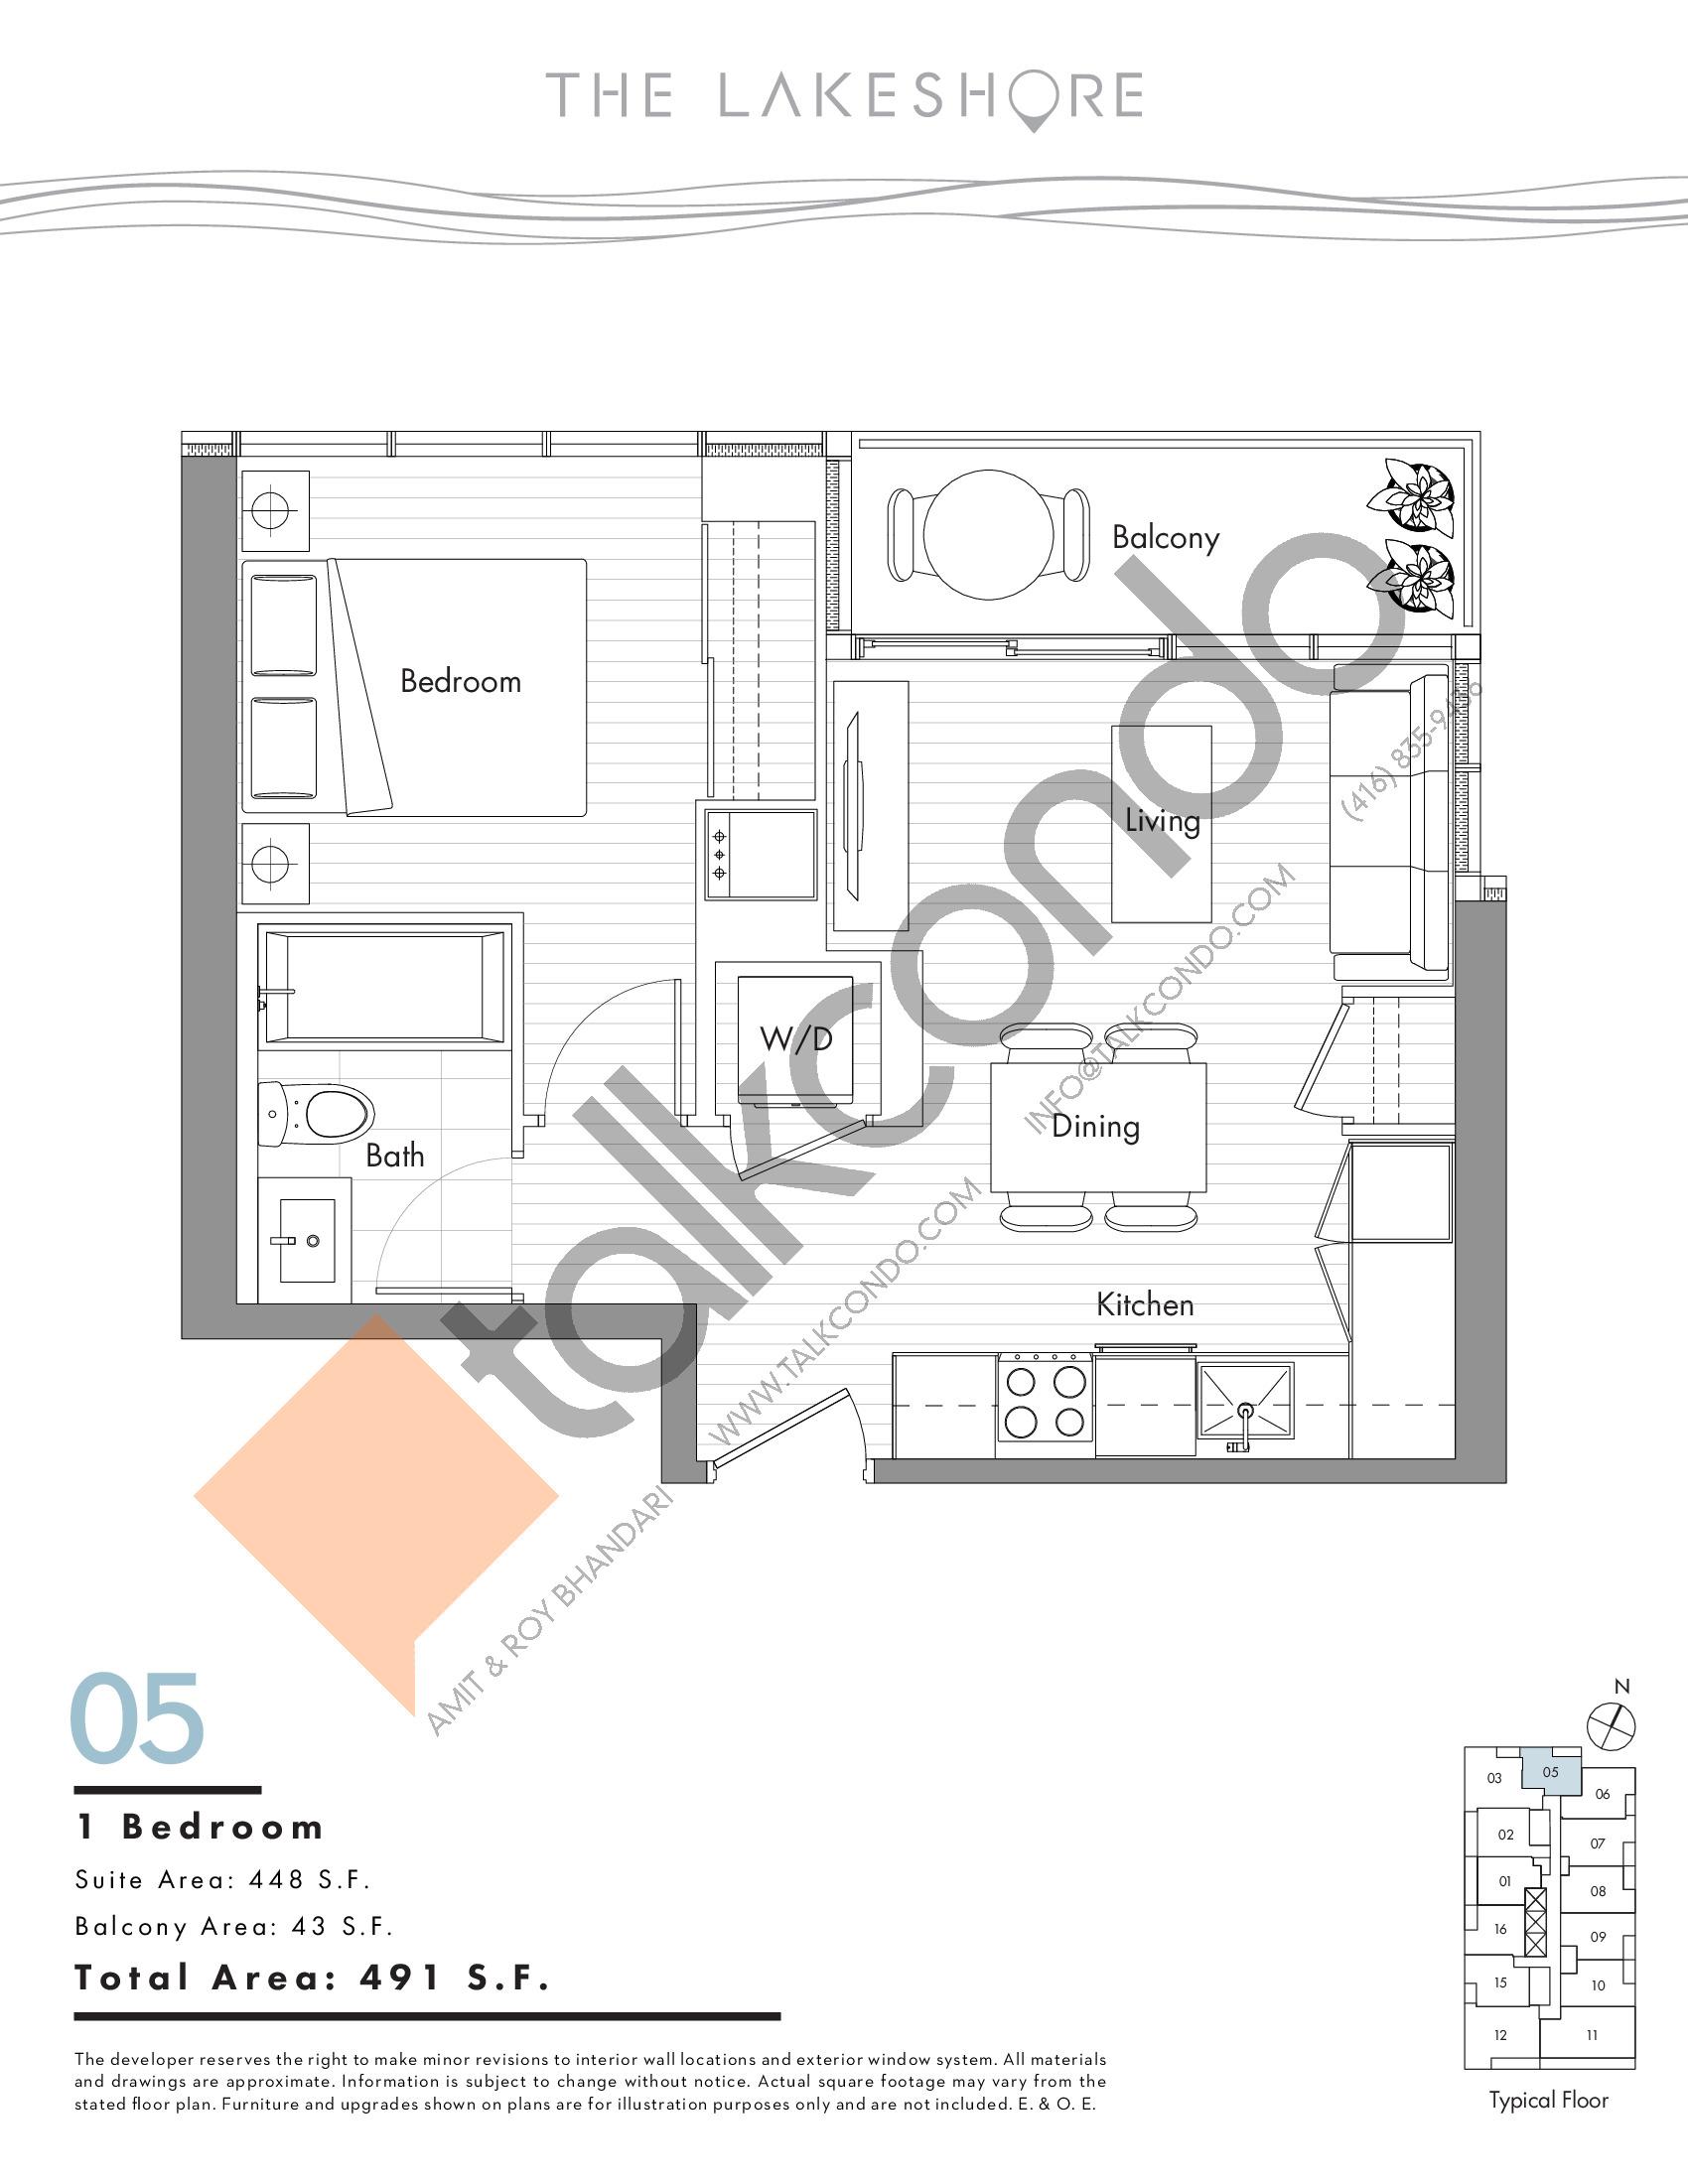 The Lakeshore Condos Floor Plans Prices Availability Talkcondo